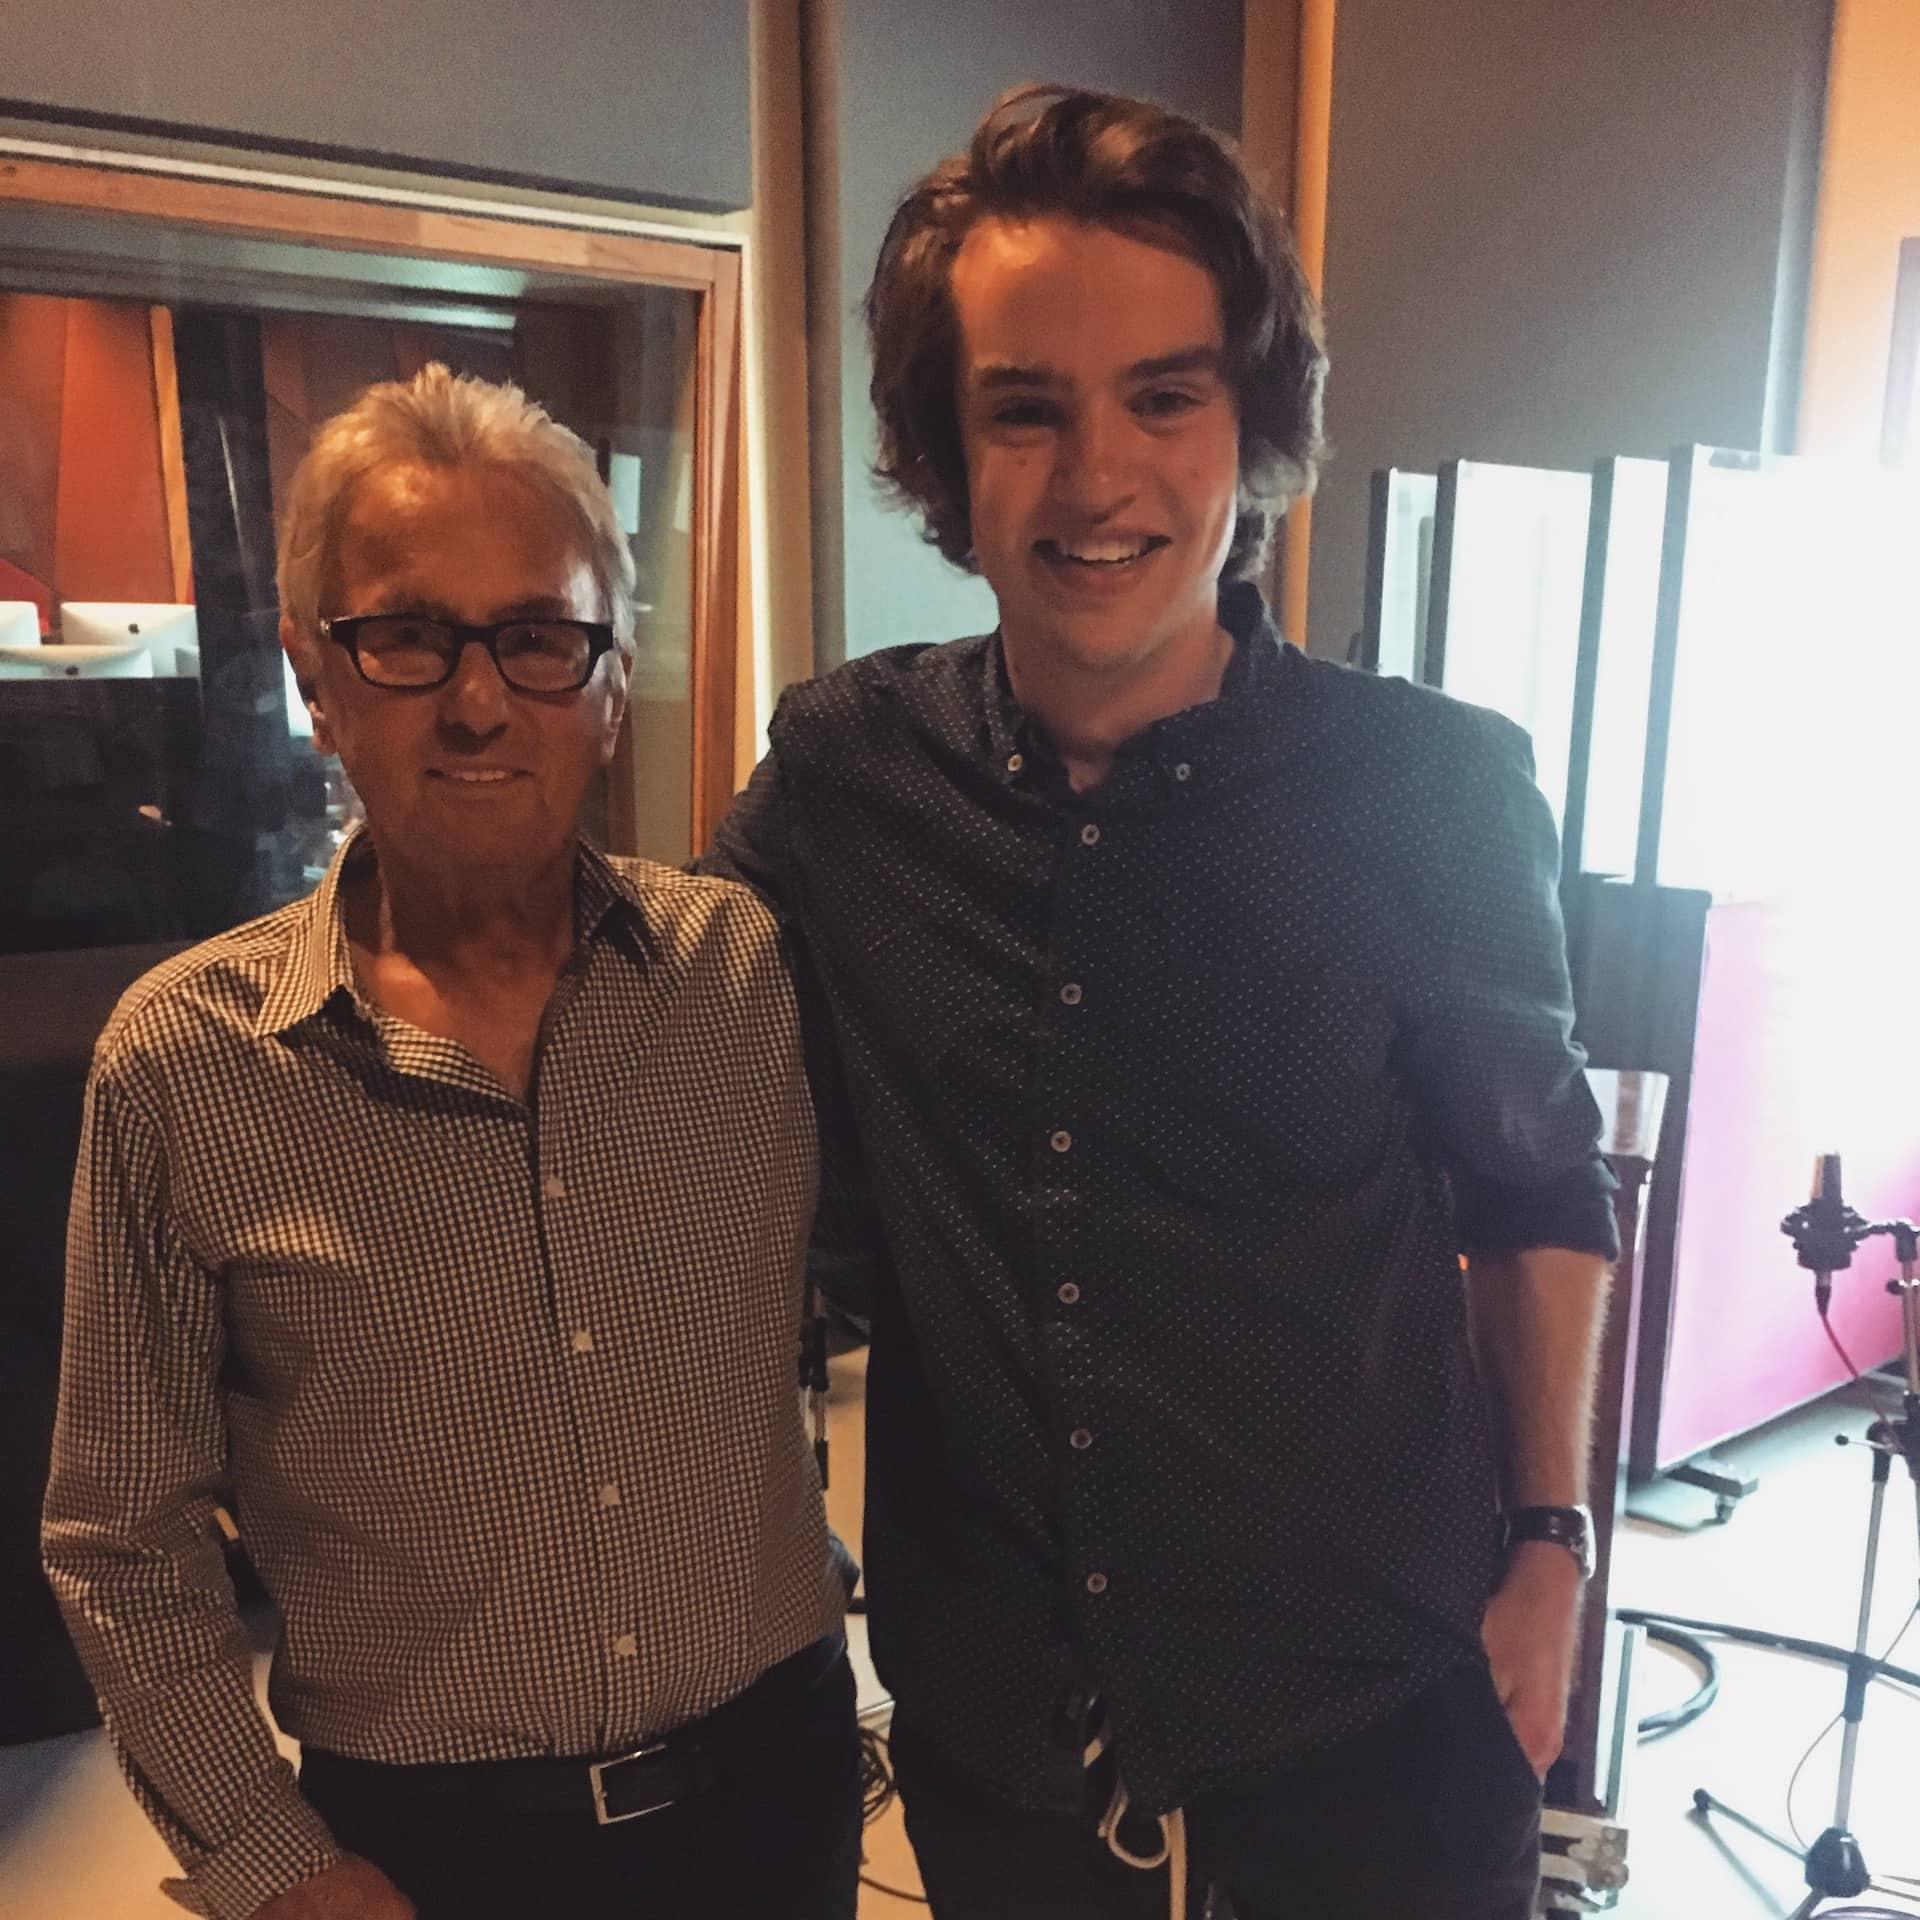 Al Schmitt and Abbey Road Institute student Ethan Frantz